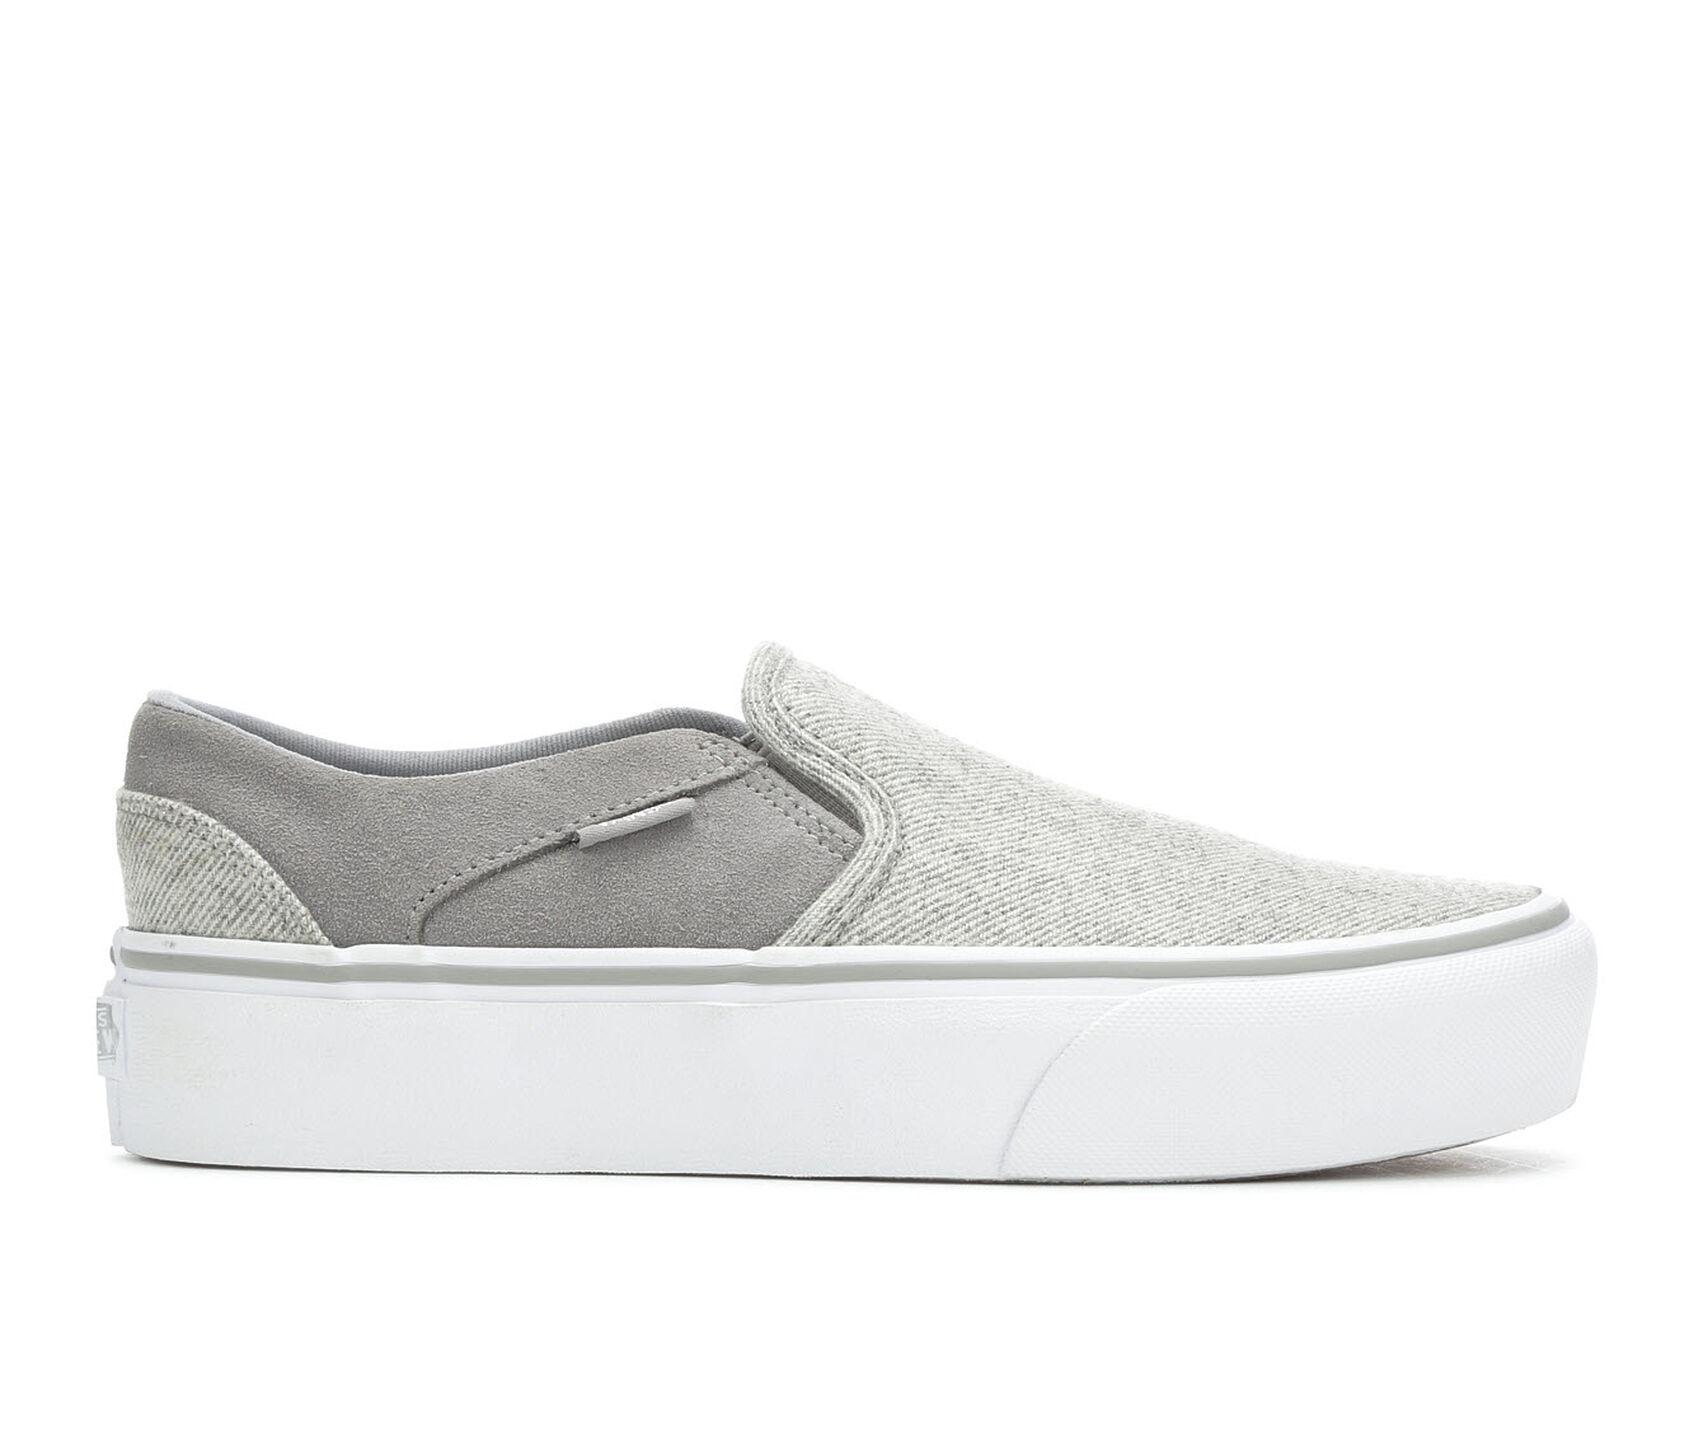 7fae675bfe5b Women's Vans Asher Platform Skate Shoes | Shoe Carnival